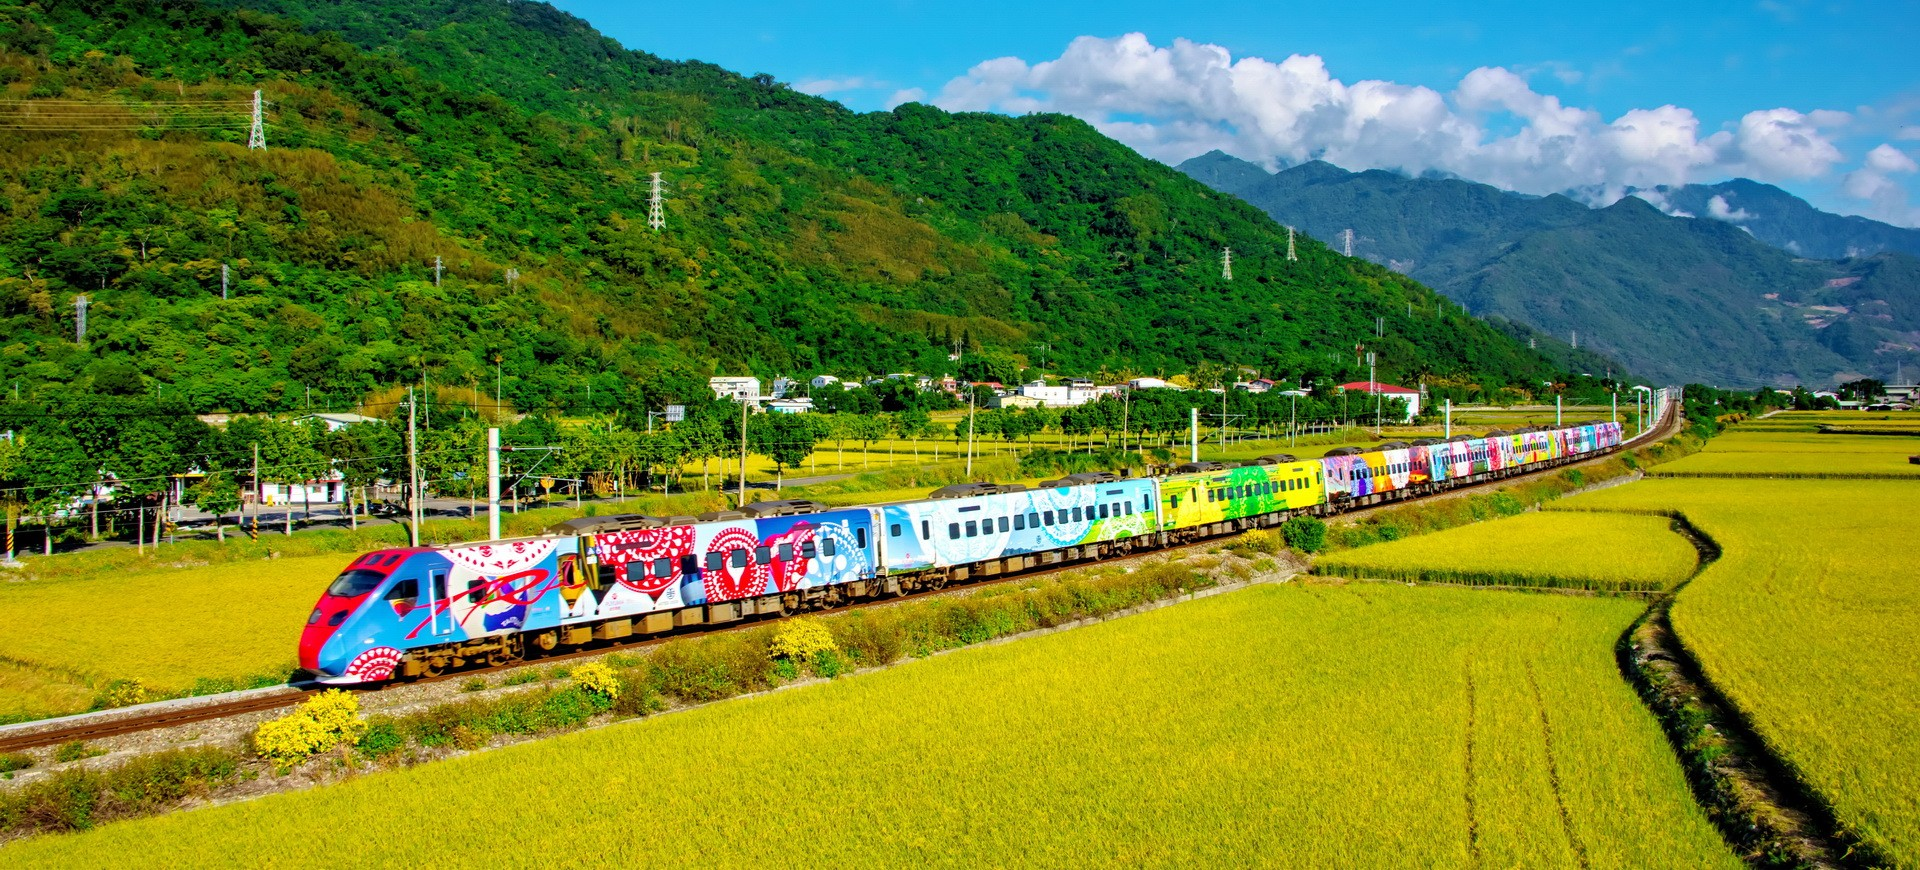 Taiwan Taitung Train traversant la campagne